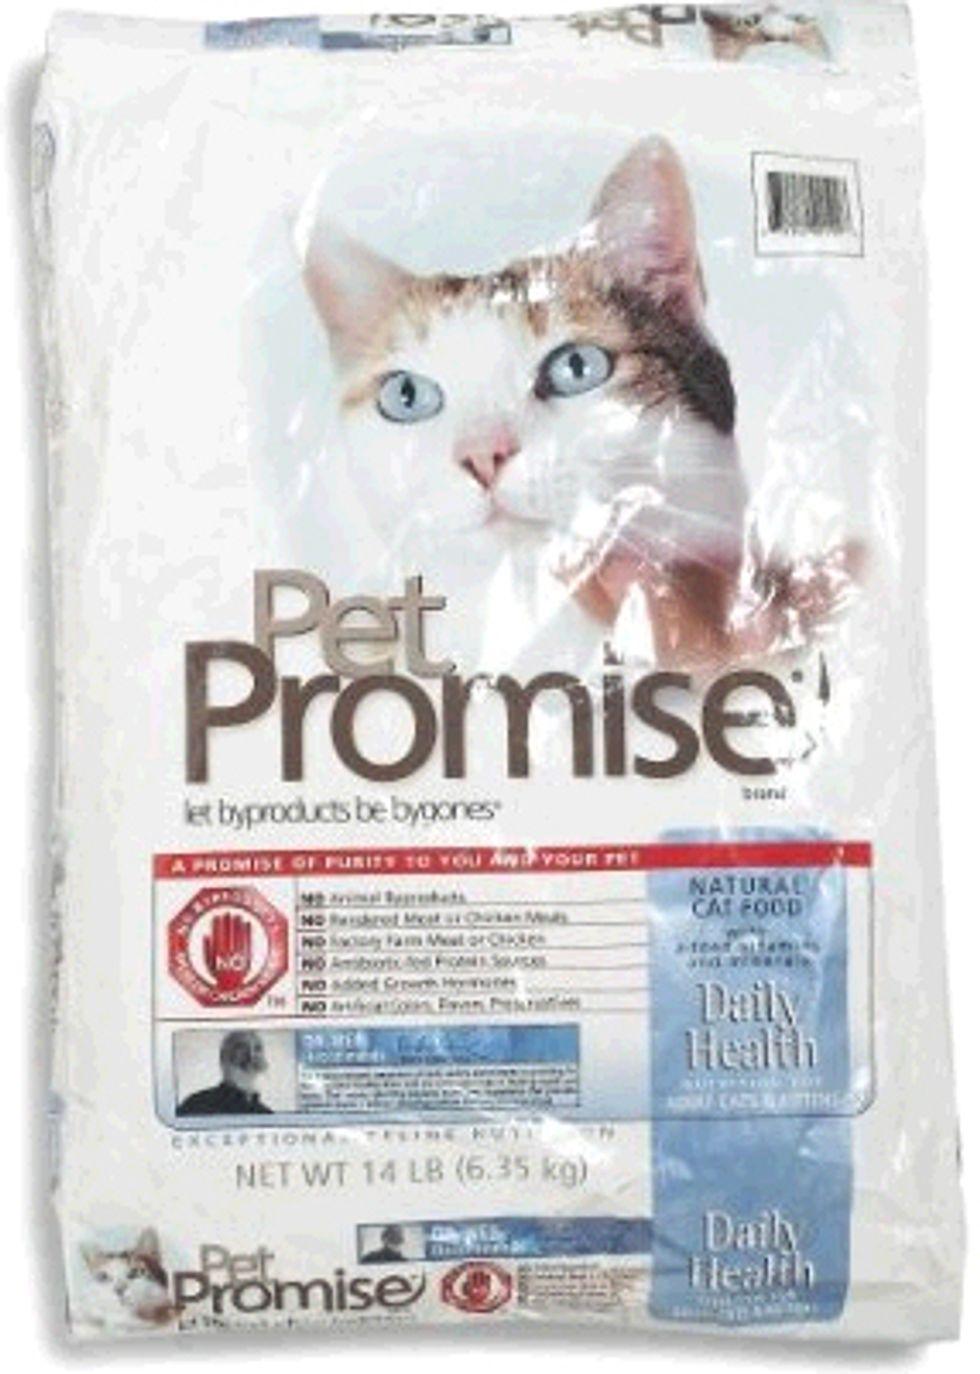 Review: Pet Promise Cat Food